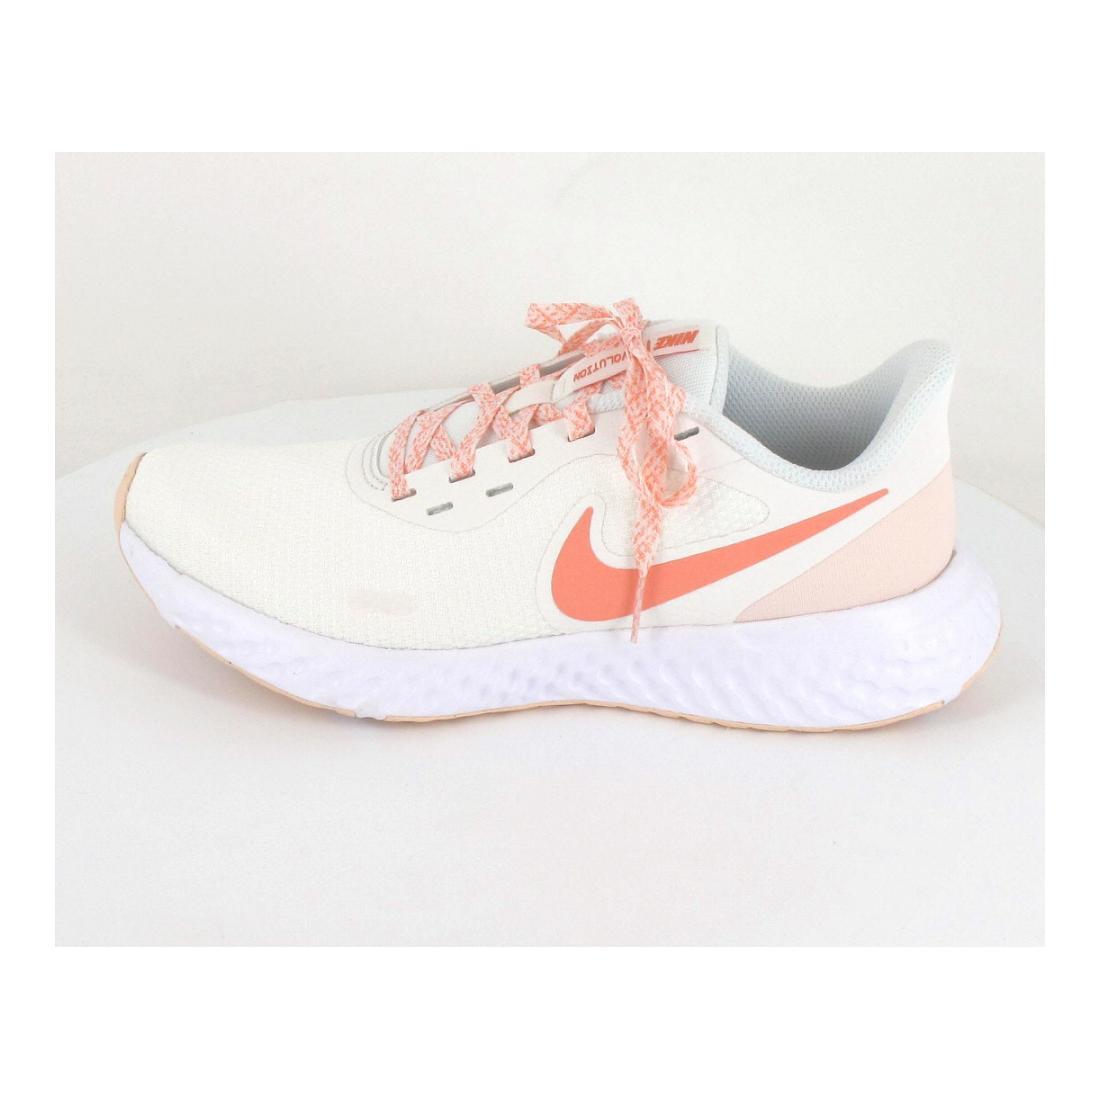 "Nike Sportschuh NIKE REVOLUTION 5 WOMEN""S"